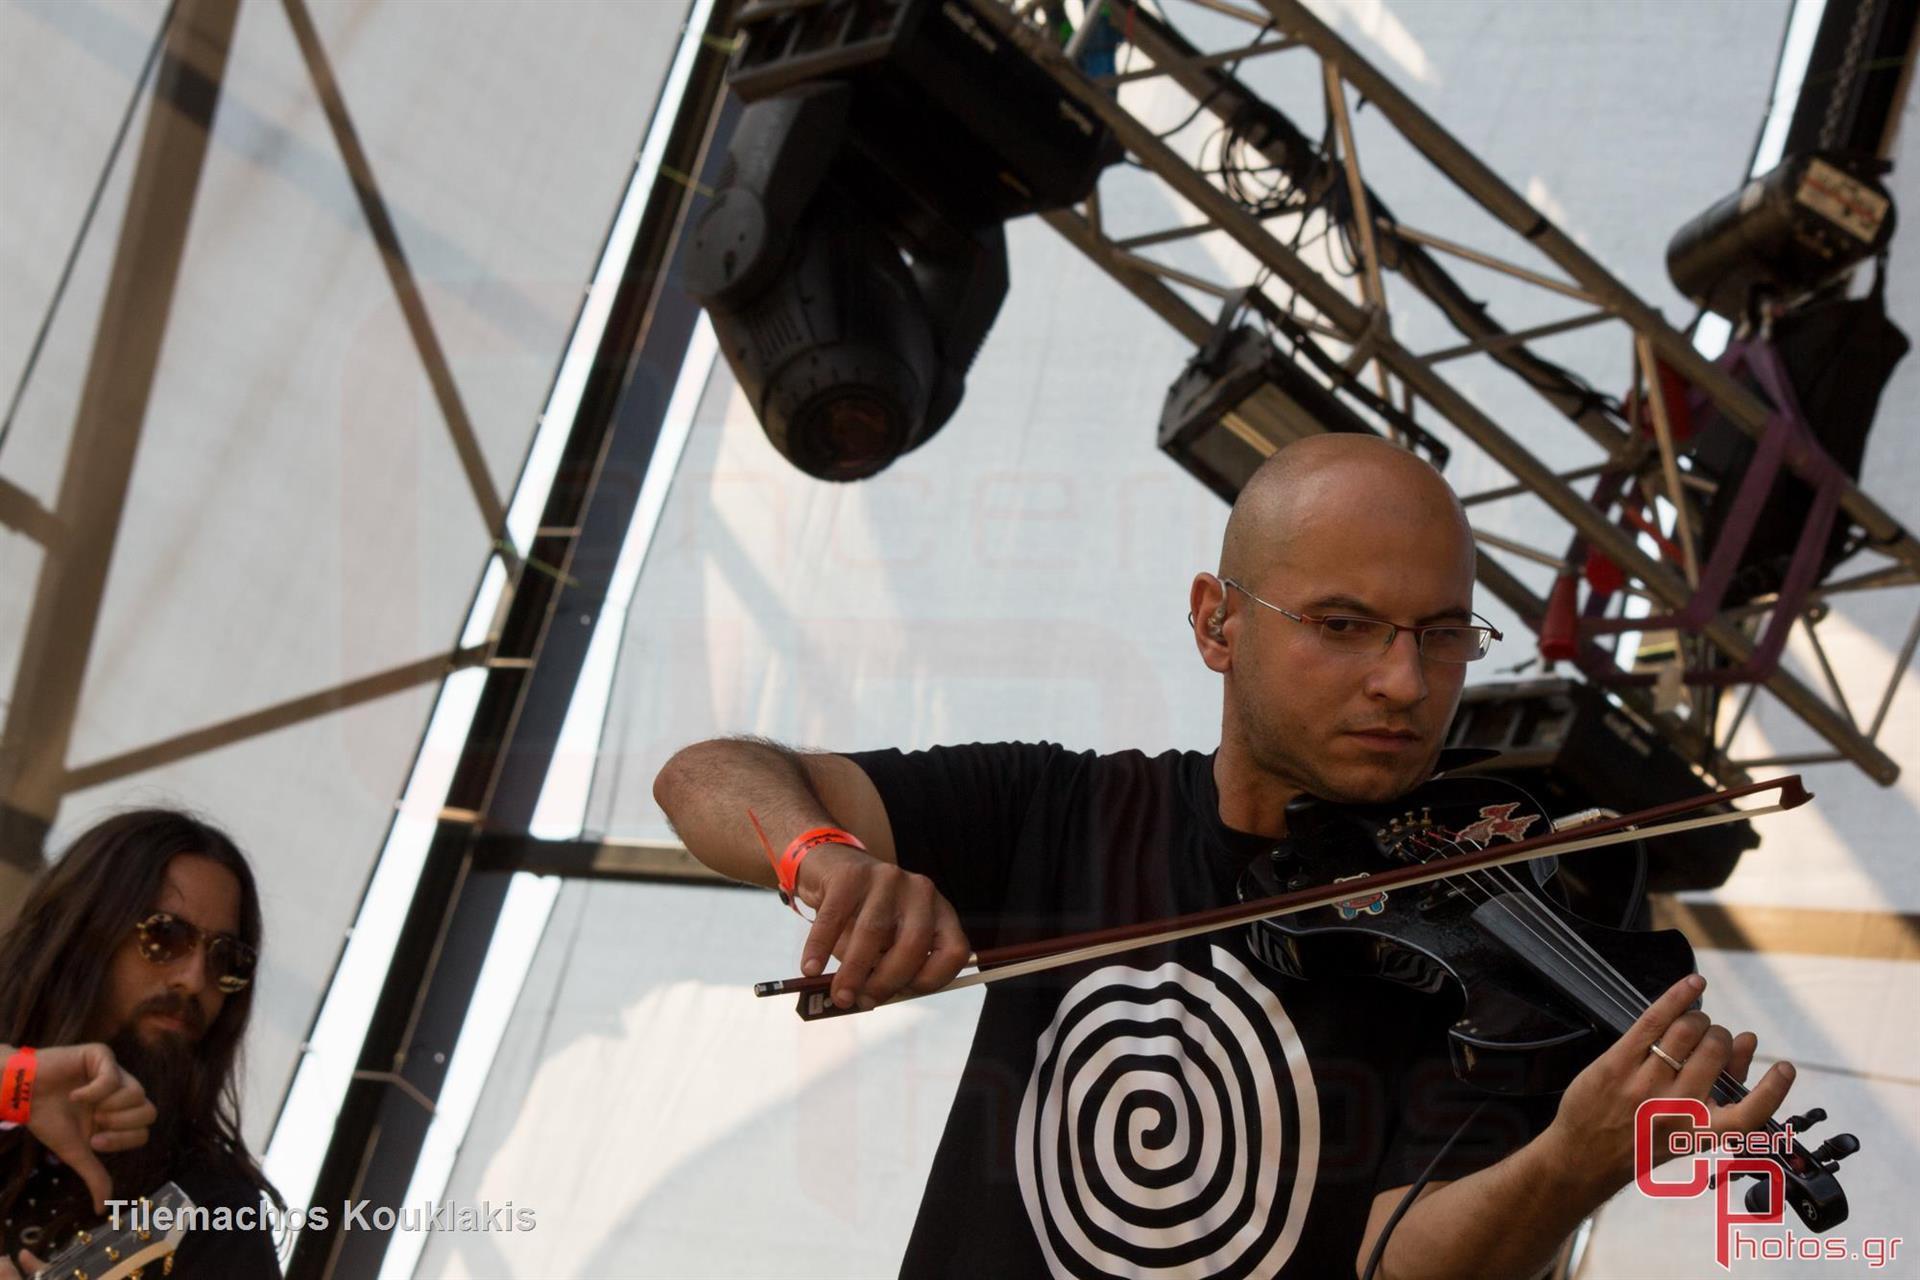 Chaostar-Chaostar photographer: Tilemachos Kouklakis - concertphotos_-0165